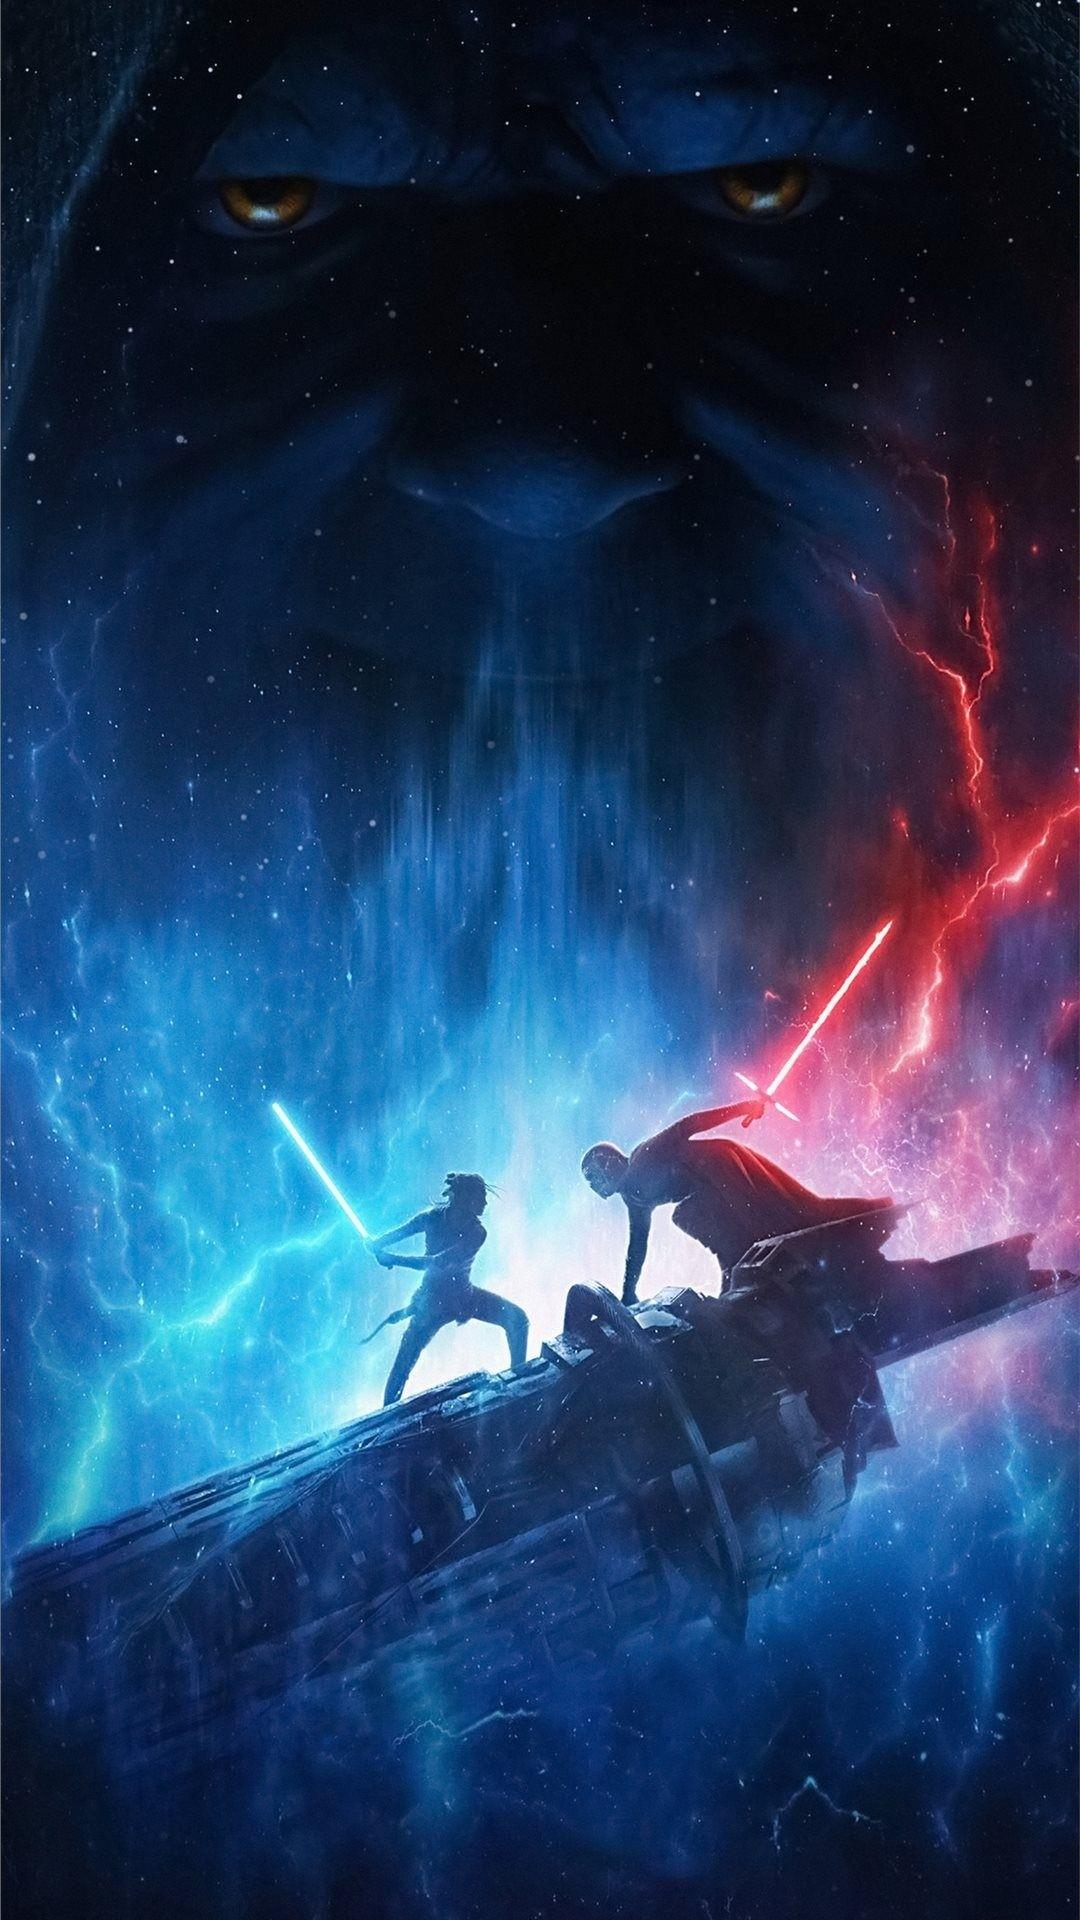 Star Wars The Rise Of Skywalker iphone 8 wallpaper